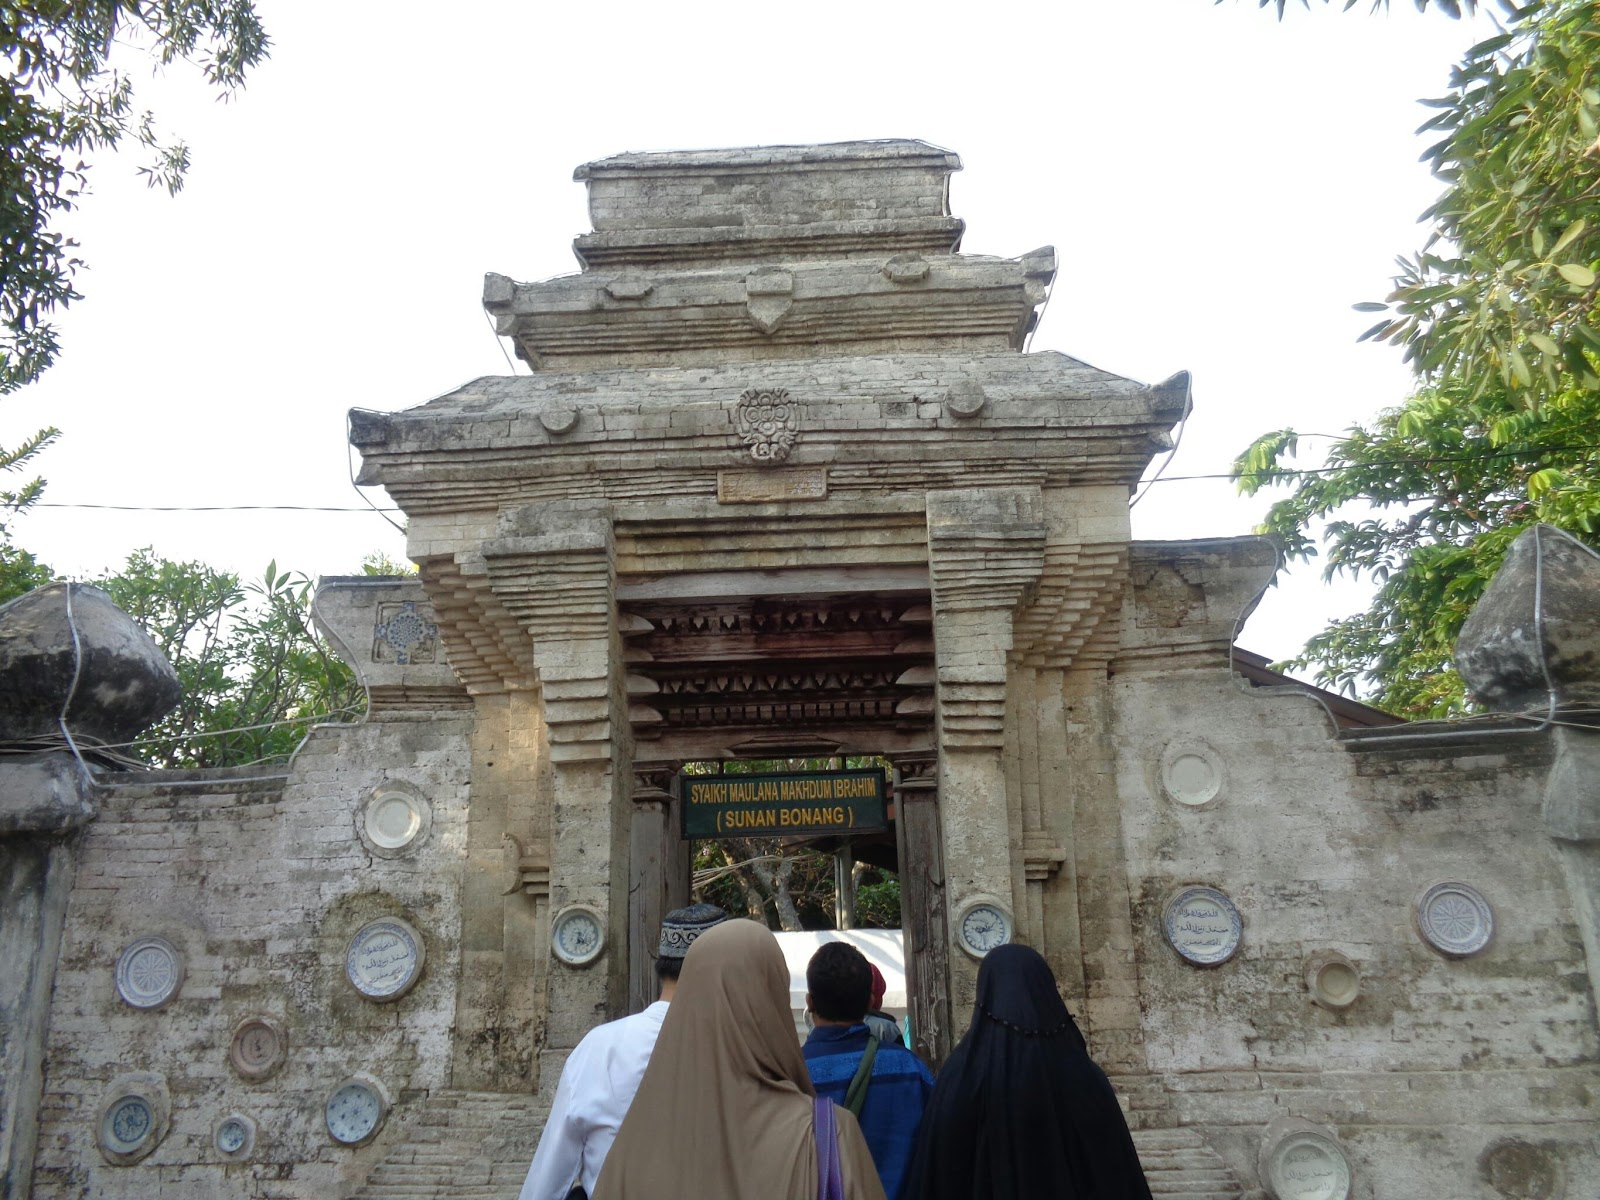 Wisata Trevelling Makam Sunan Bonang Tidak Lupa Membeli Oleh Berfoto